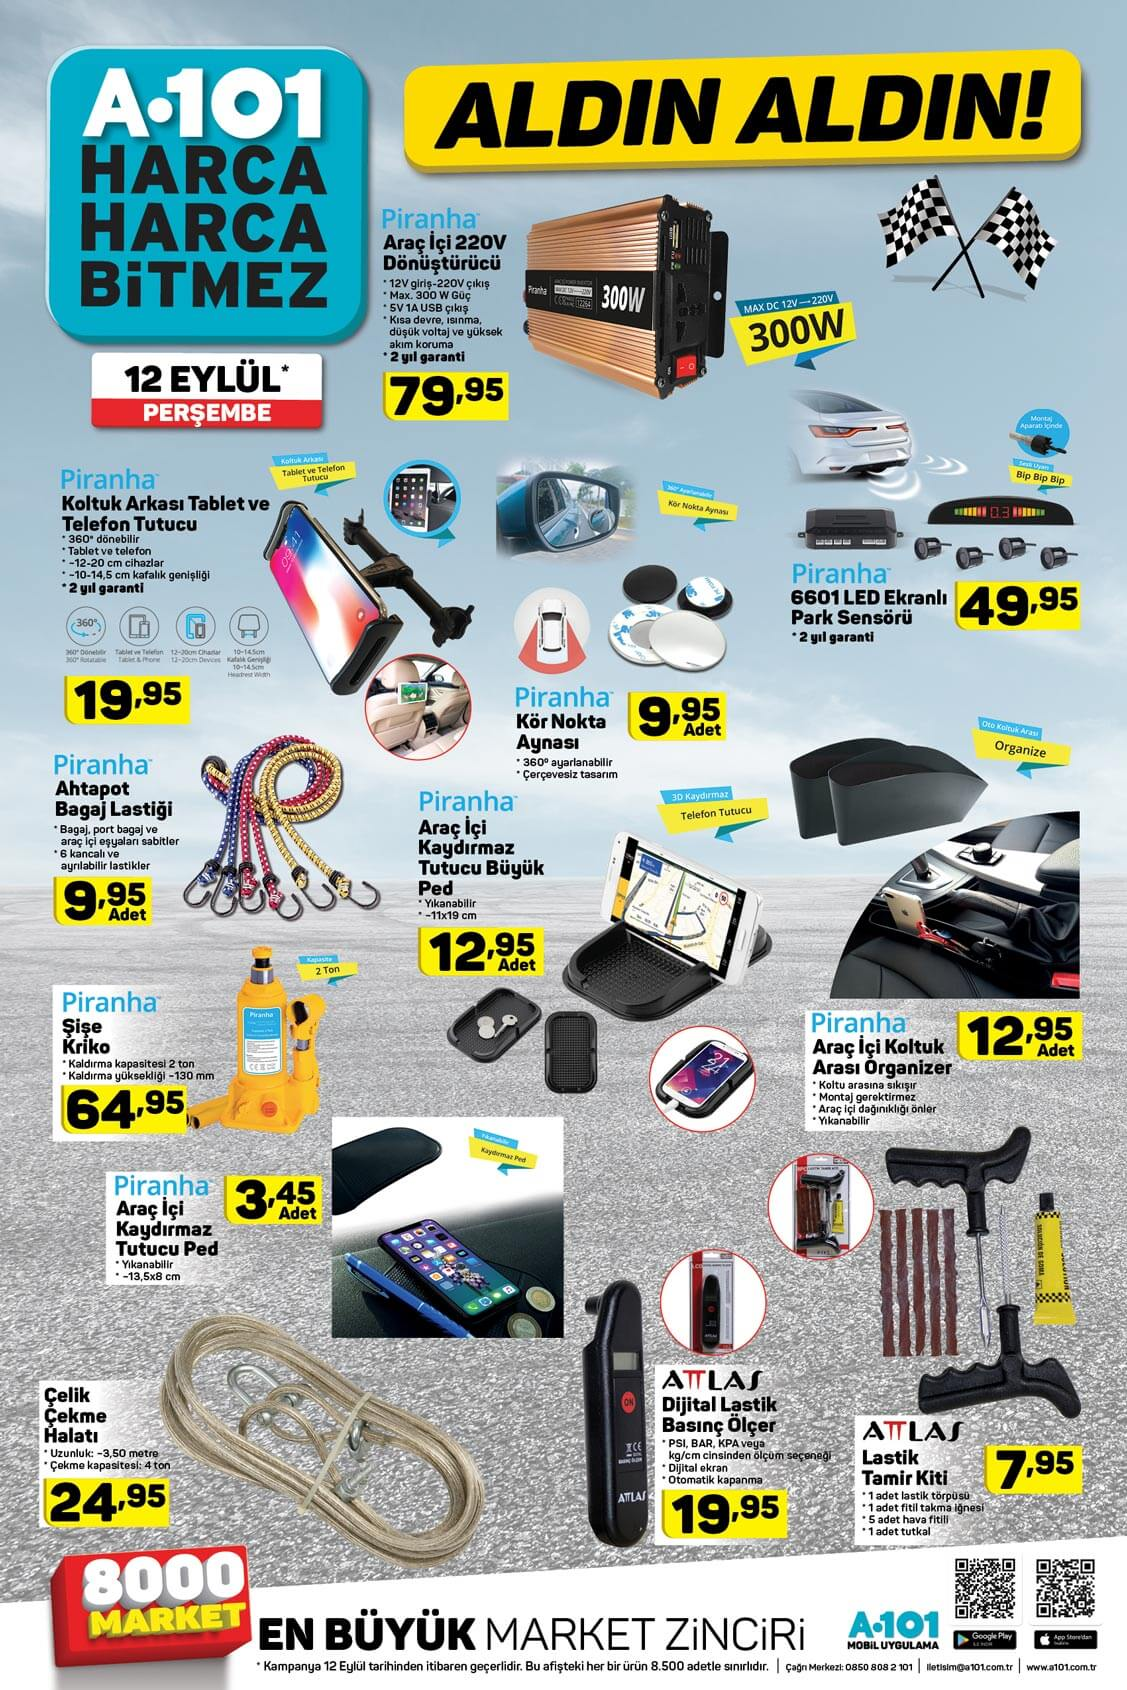 A101 12 Eylül 2019 Otomobil ürünleri